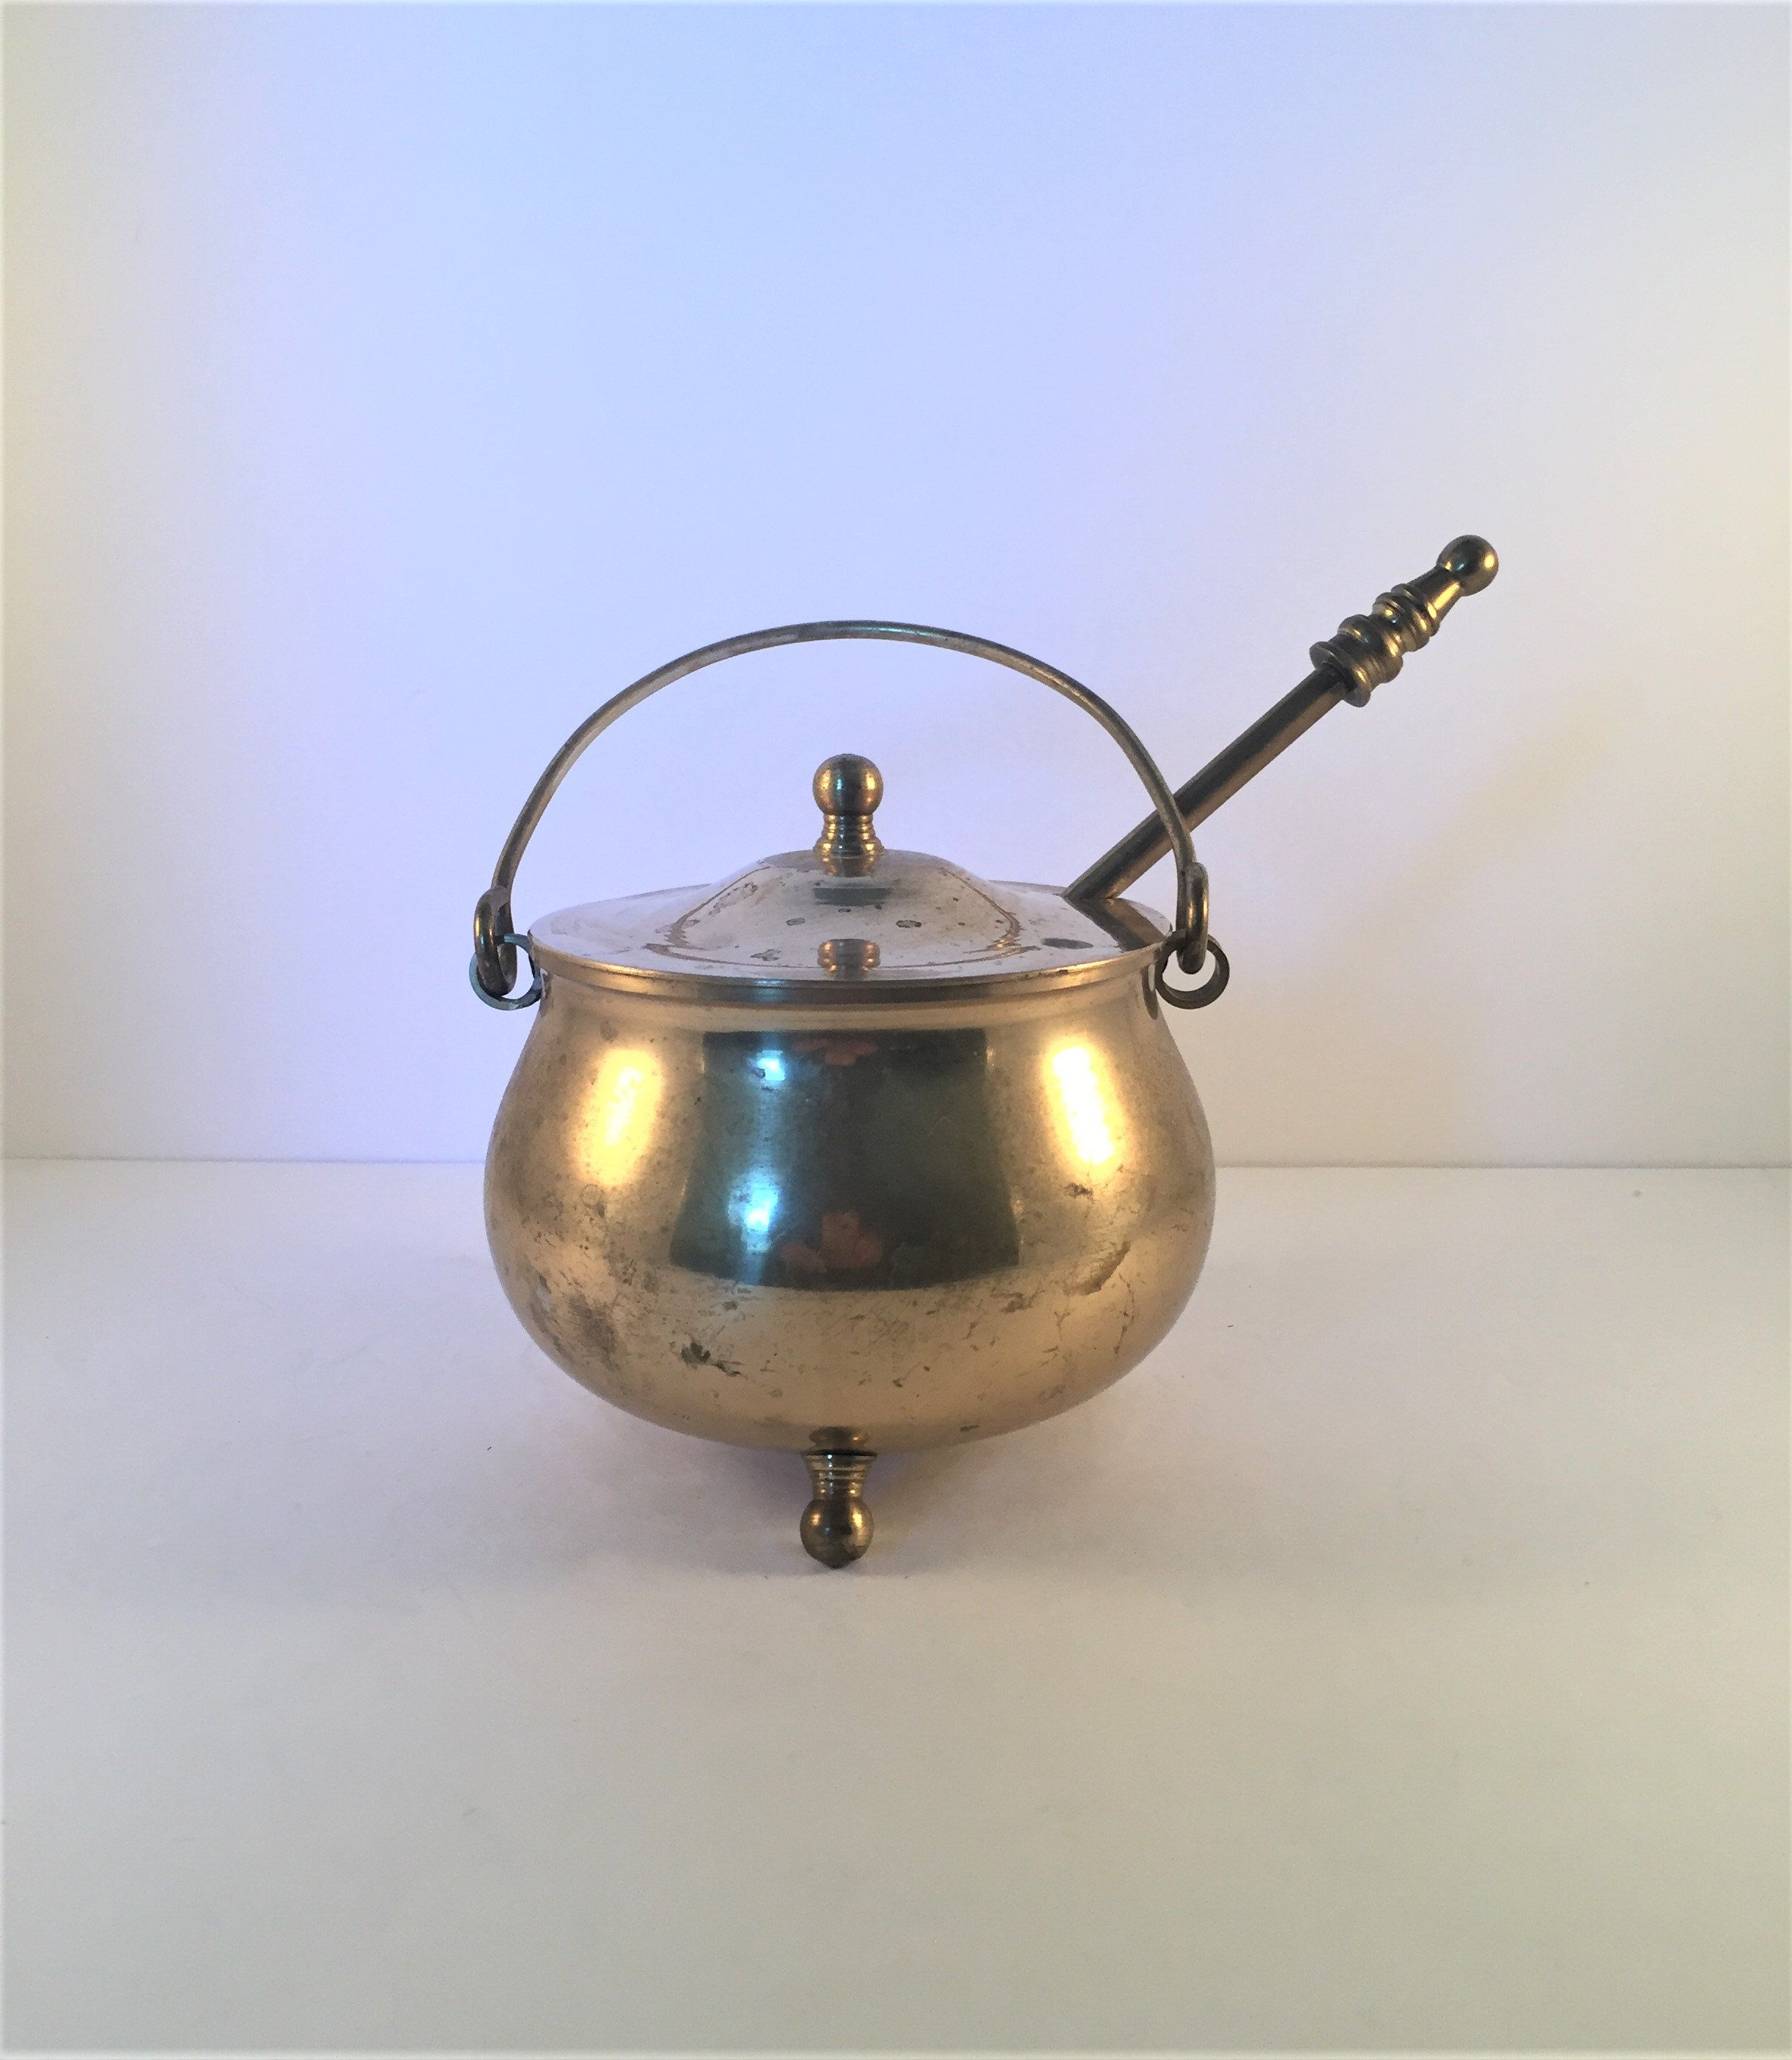 antique fire starter solid brass cauldron fire starter made in japan